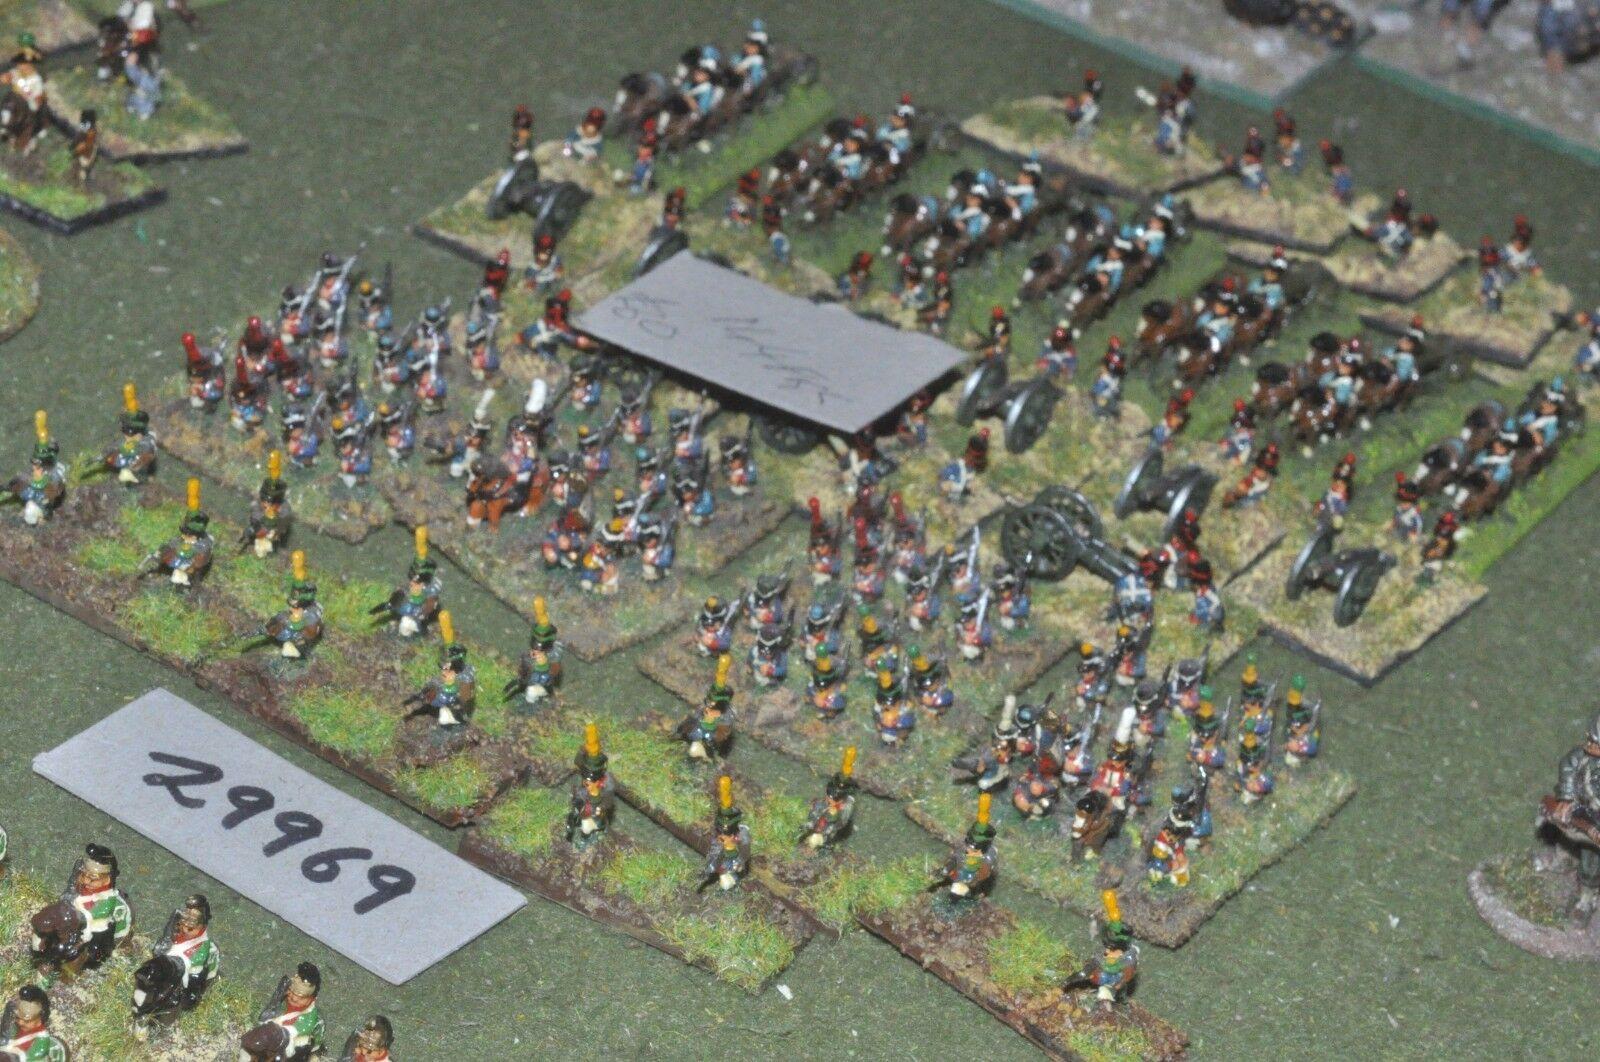 6mm napoleonic   french - battle group (adler) 144 figures - inf (29969)